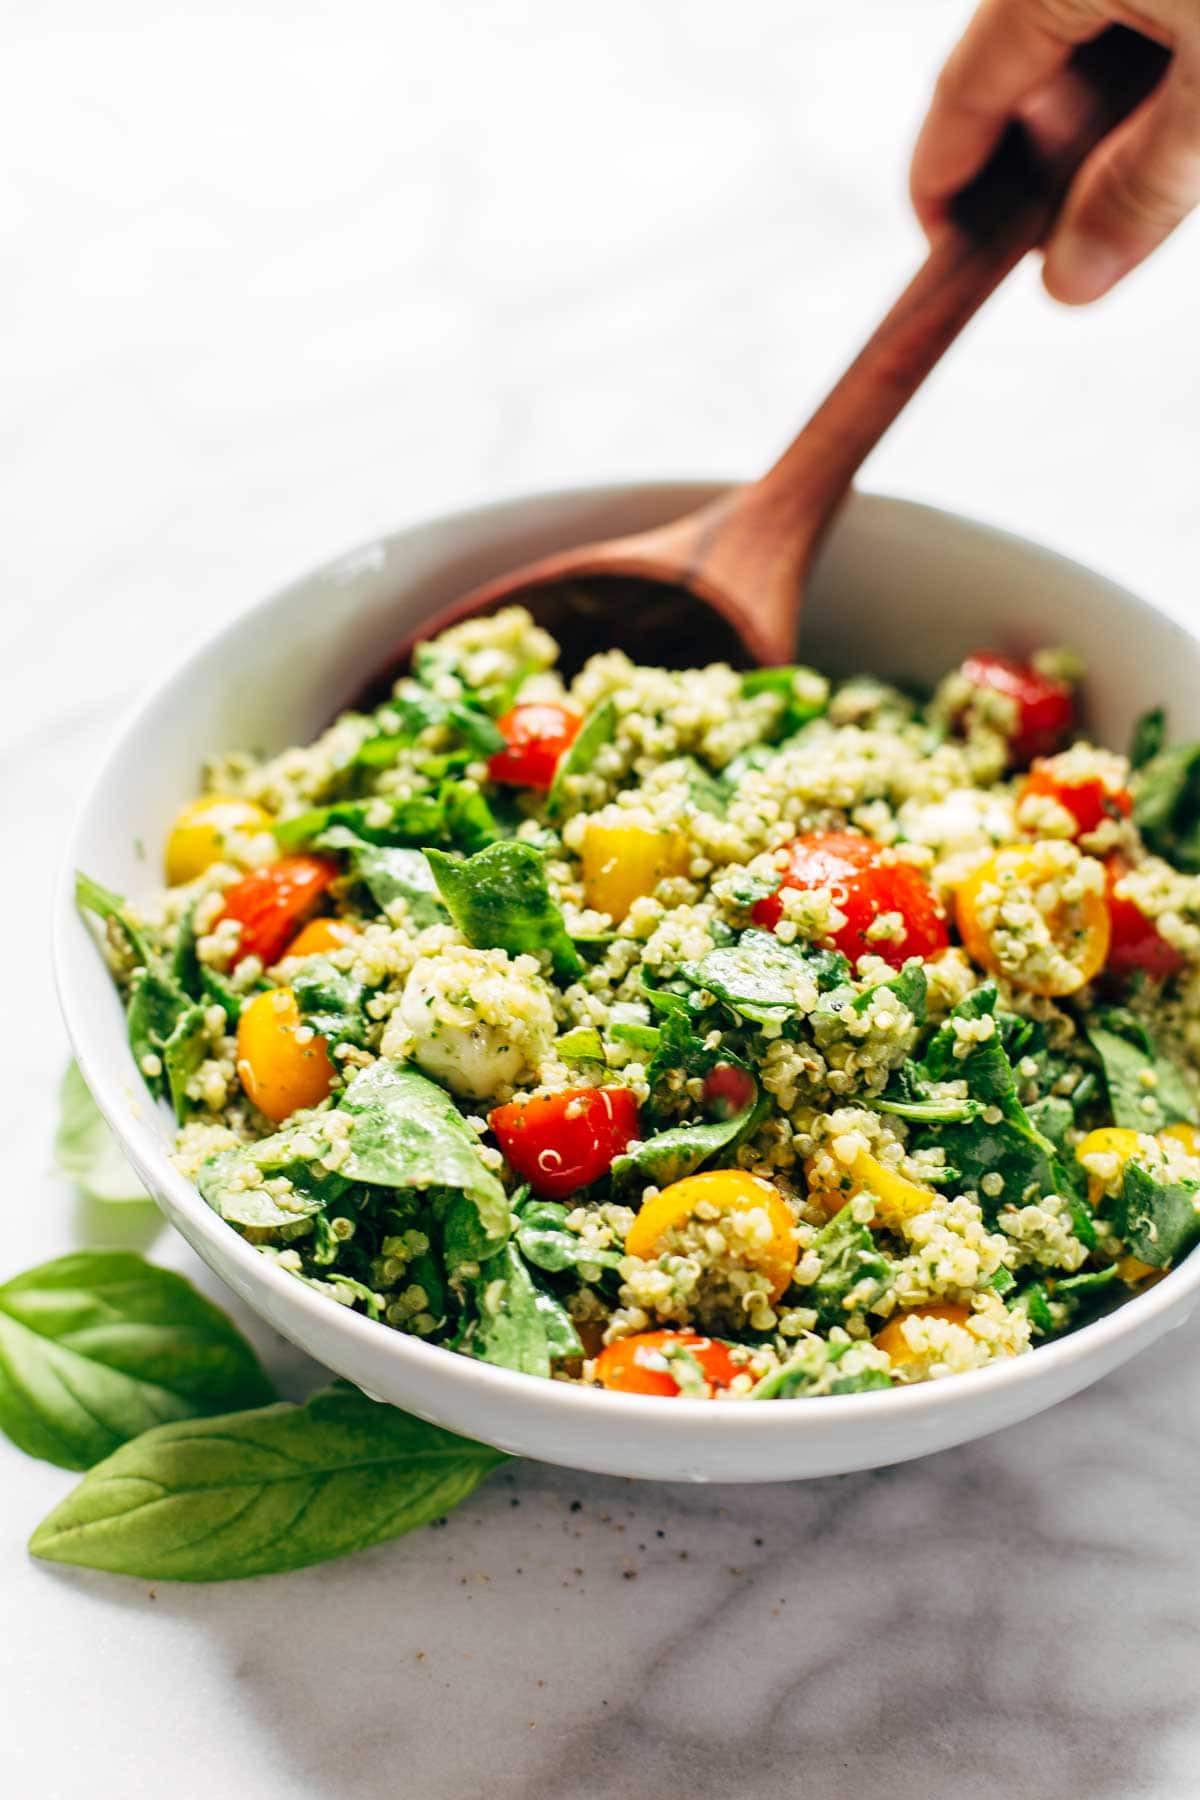 Vegan Summer Recipes  Green Goddess Quinoa Summer Salad Recipe Pinch of Yum